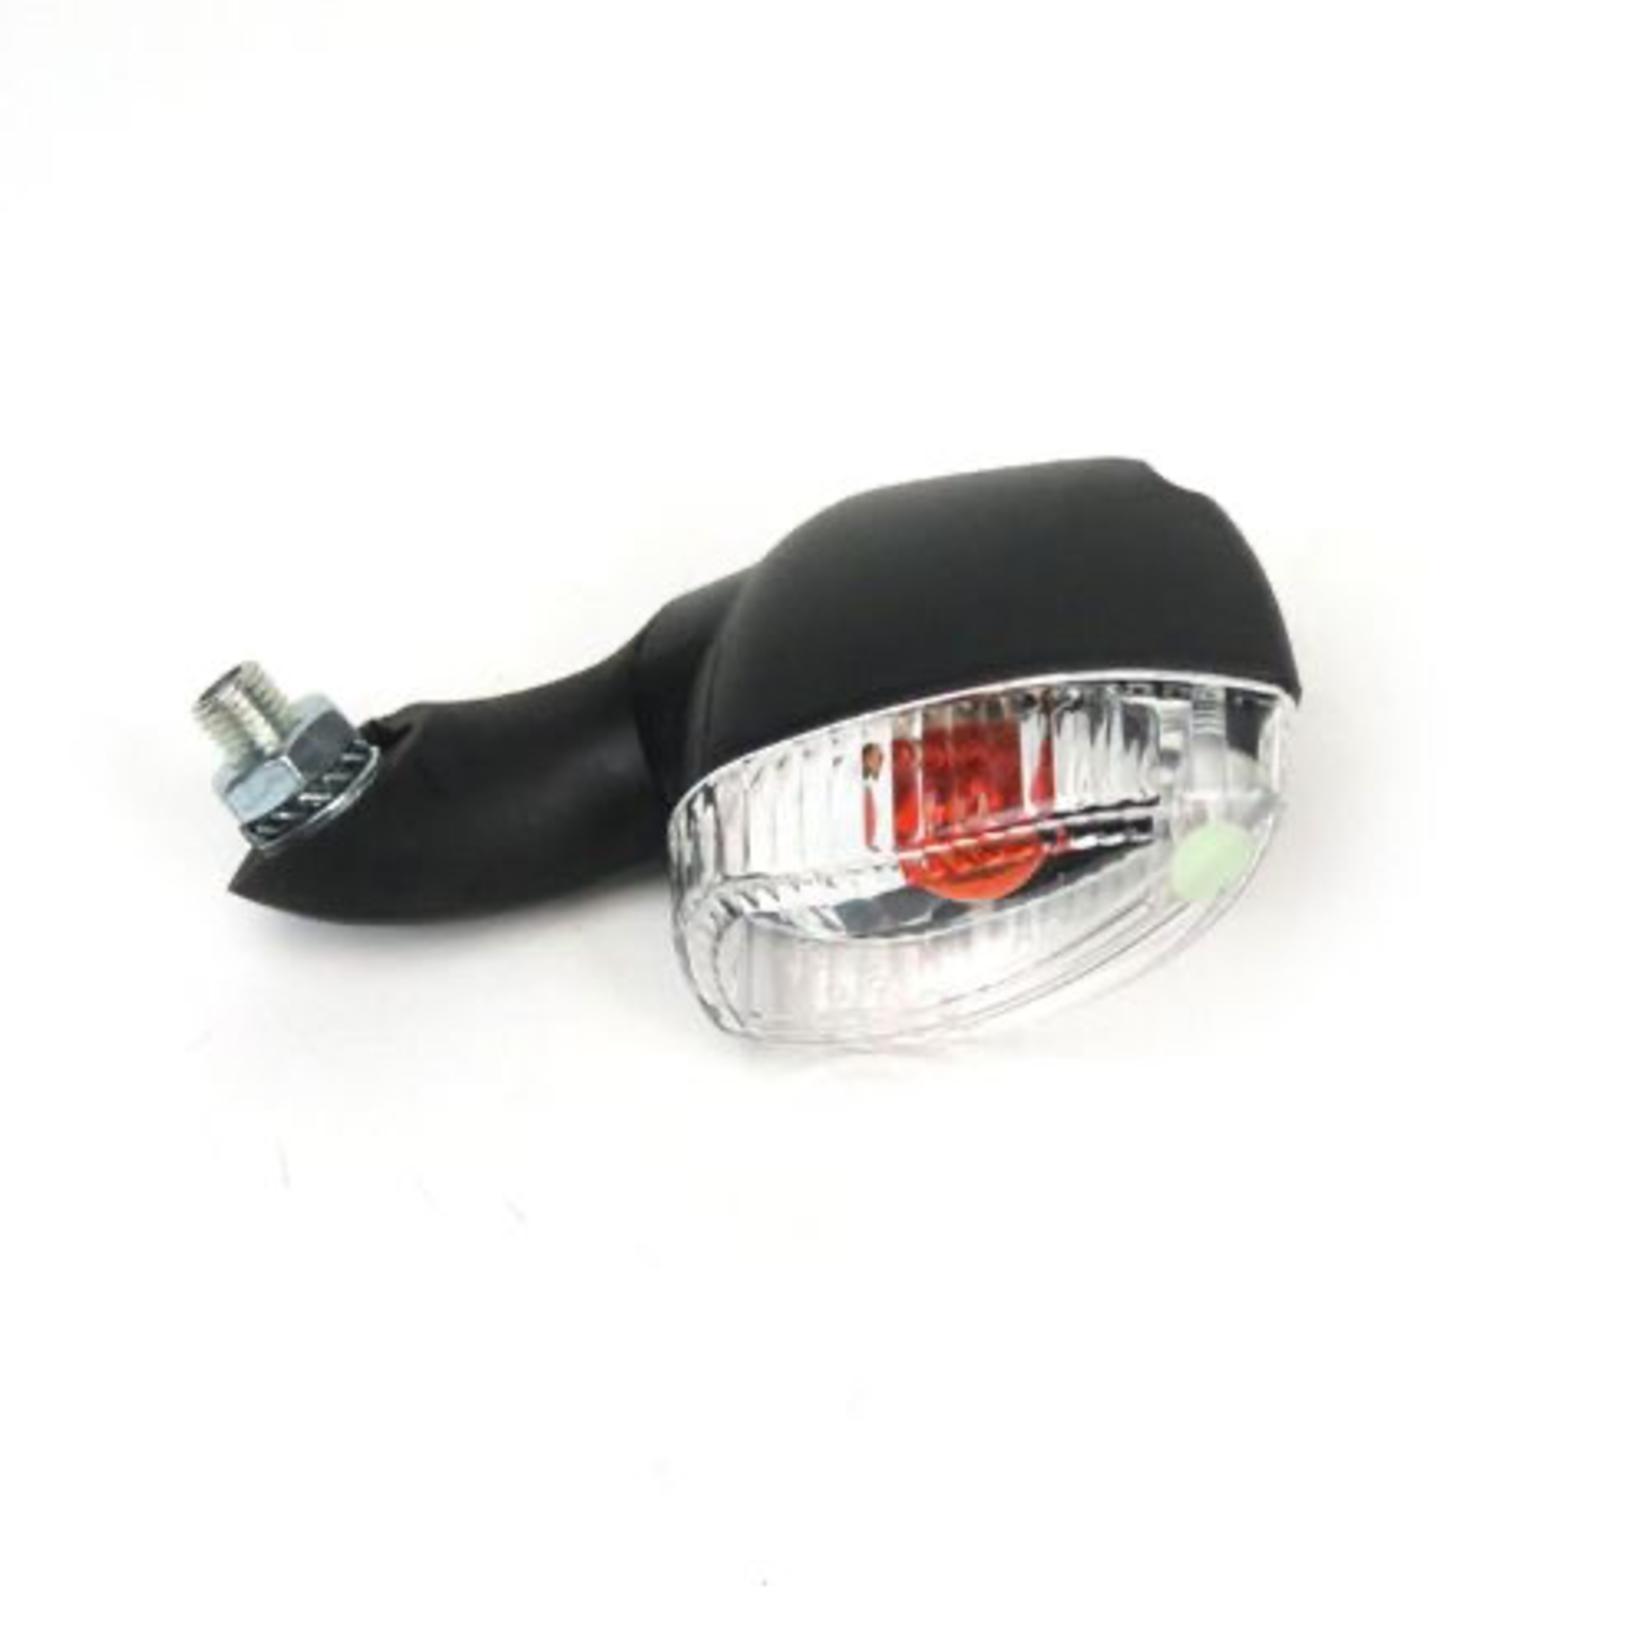 Parts Signal Lamp, LH Primavera/Sprint North American